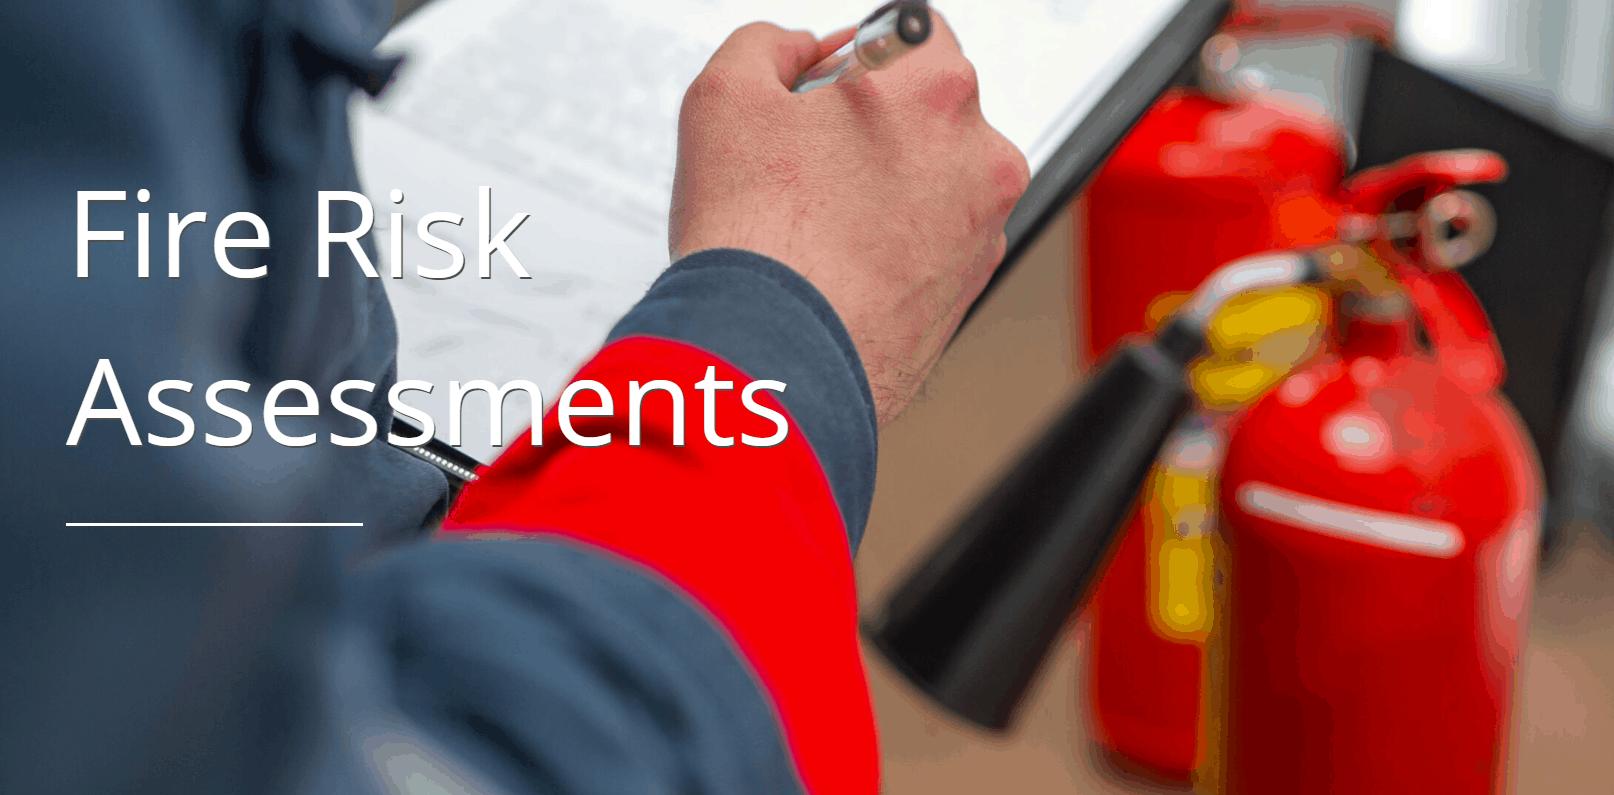 Fire Risk Assessments Mobile